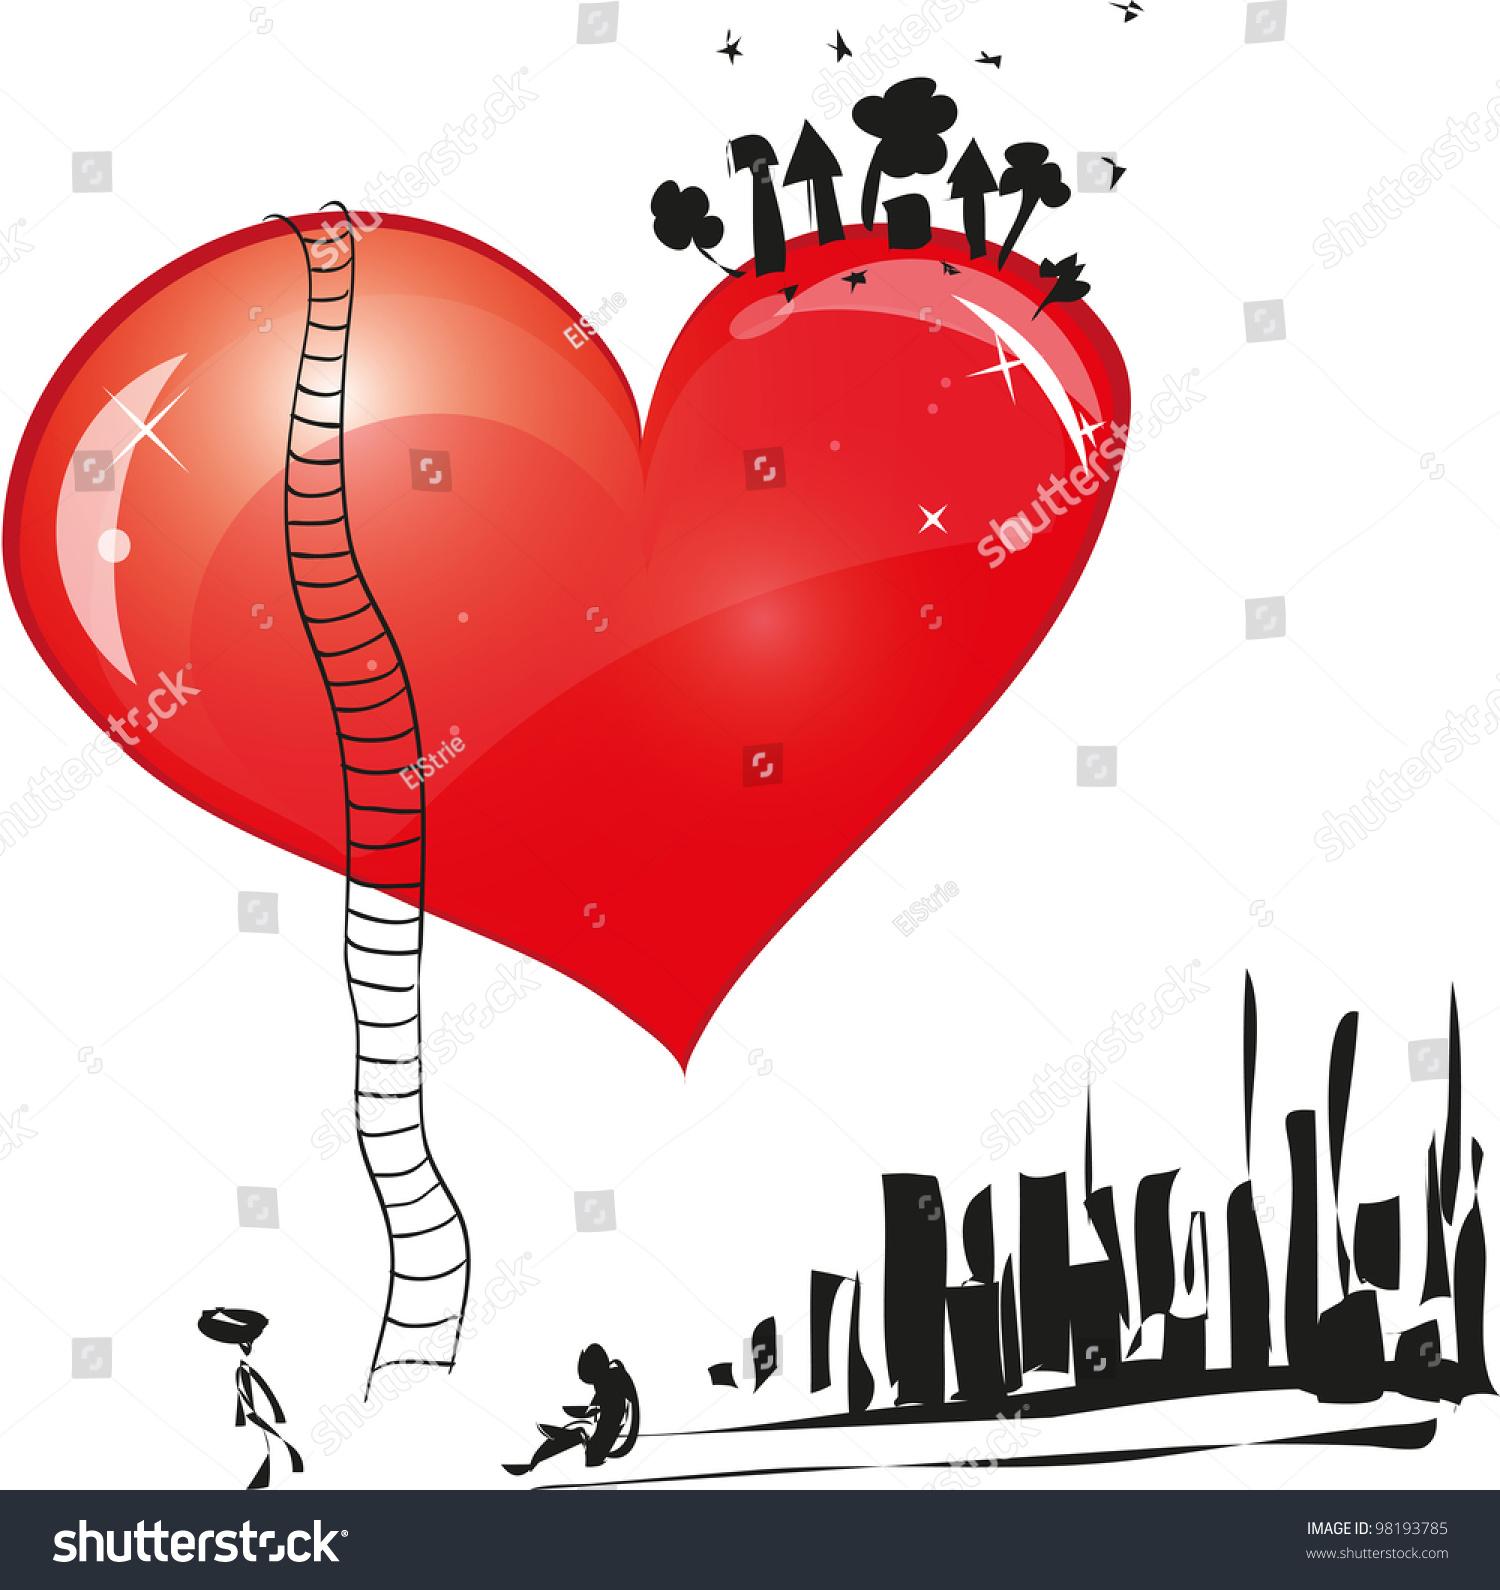 Symbol Love Large Heart On Him Stock Illustration 98193785